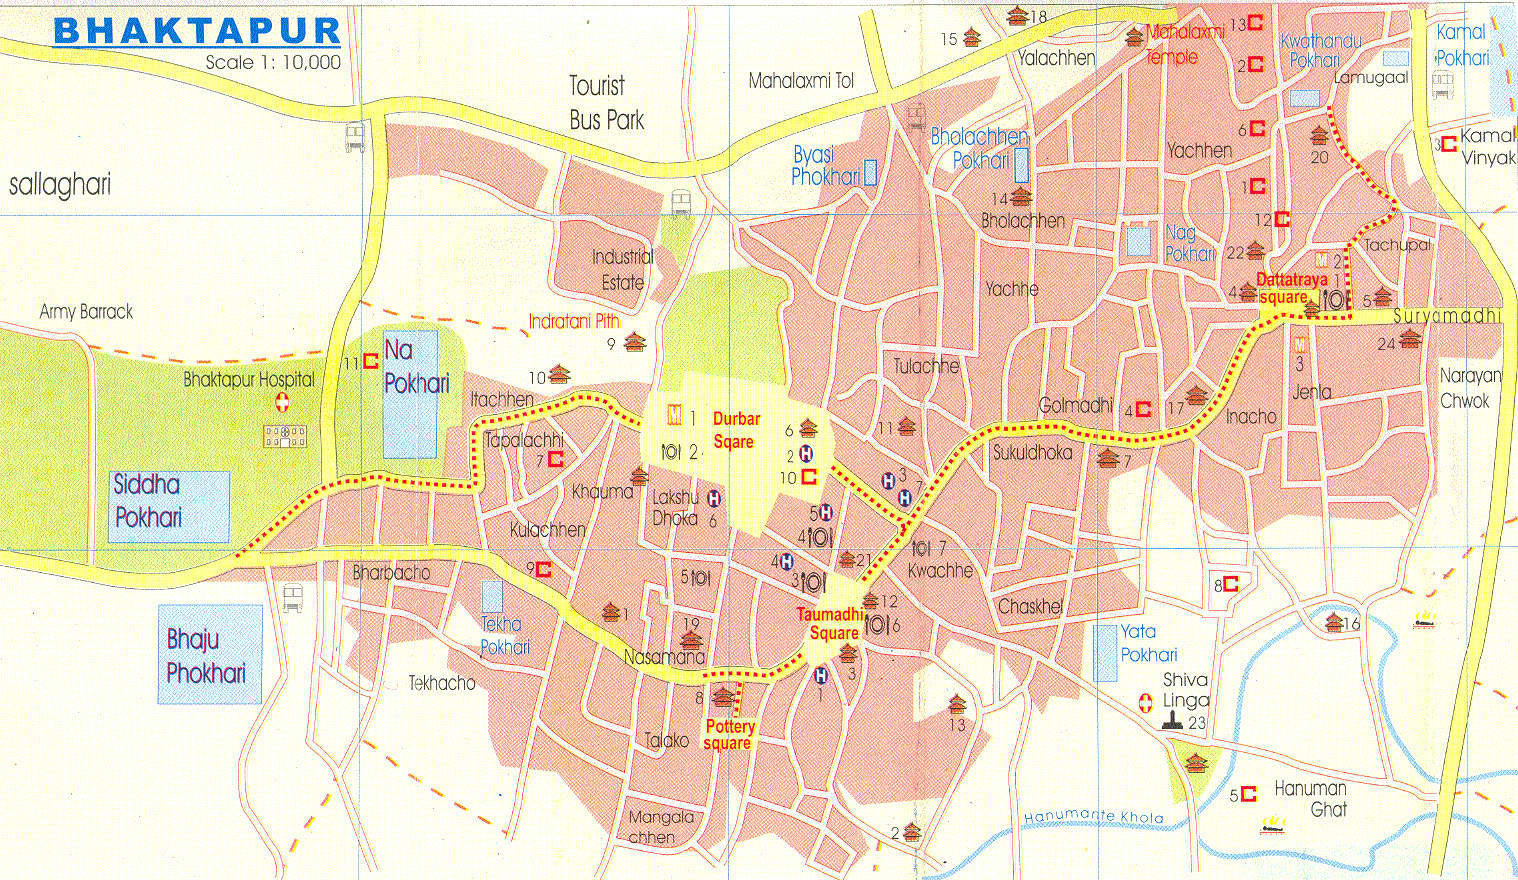 Mapa de Bhaktapur, Nepal